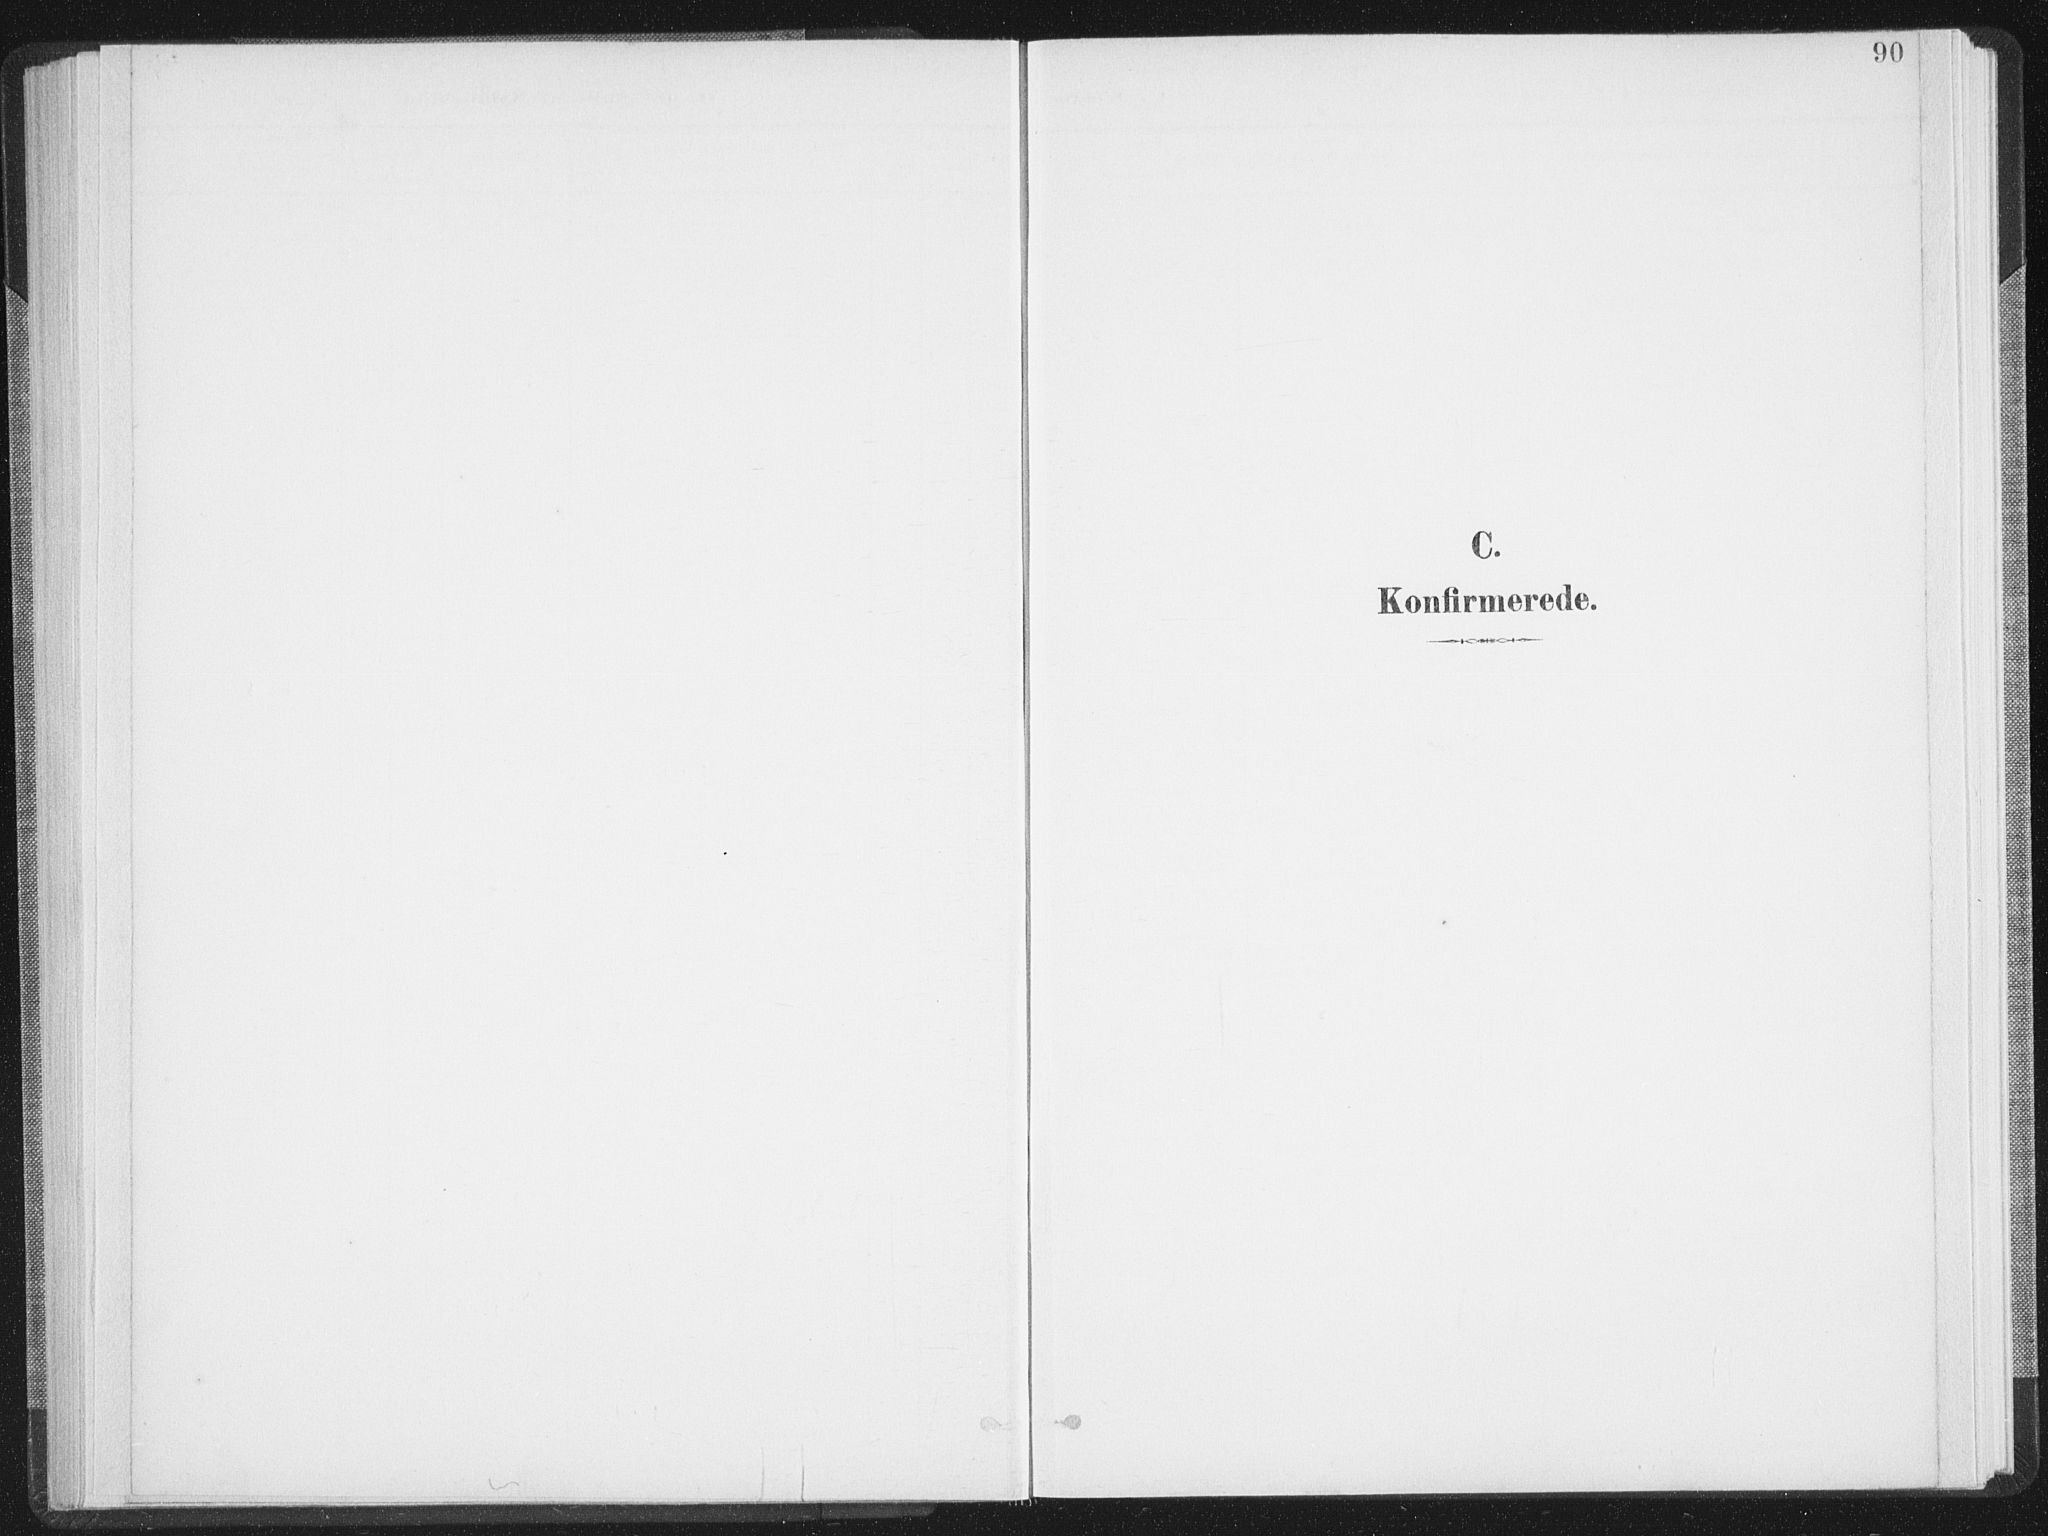 SAT, Ministerialprotokoller, klokkerbøker og fødselsregistre - Nordland, 897/L1400: Ministerialbok nr. 897A07, 1897-1908, s. 90